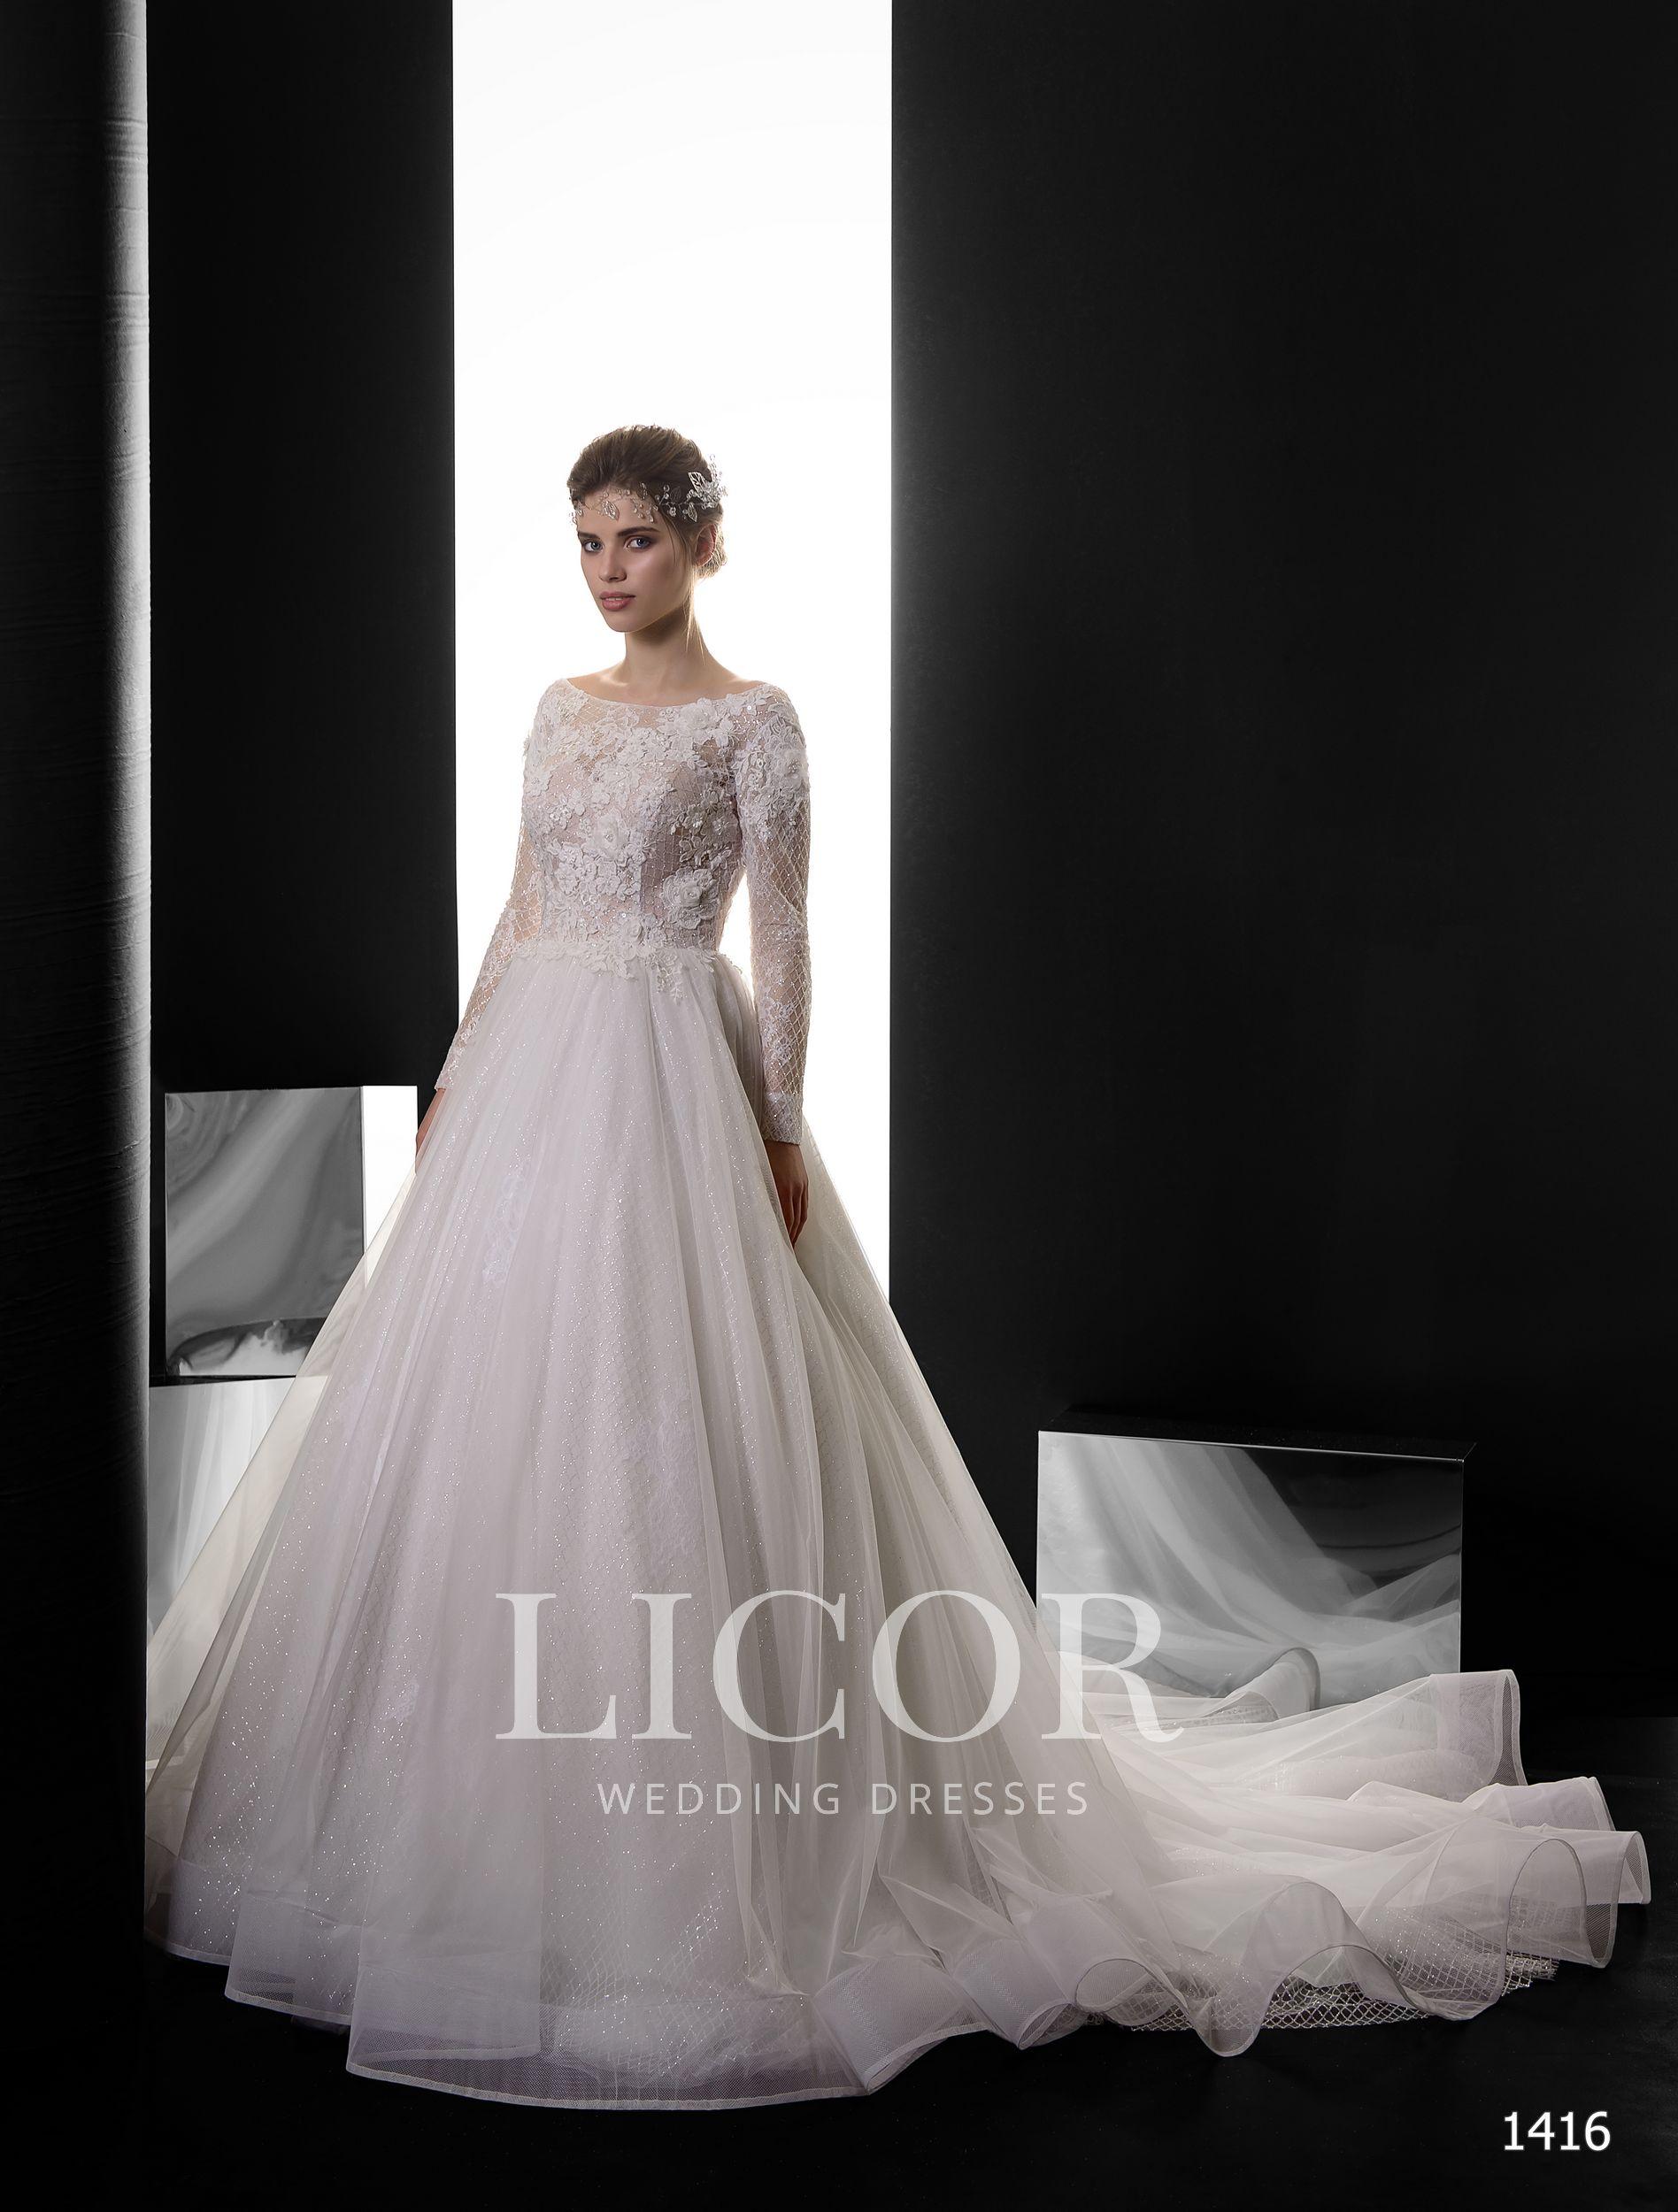 http://licor.com.ua/images/stories/virtuemart/product/1416(1).jpg